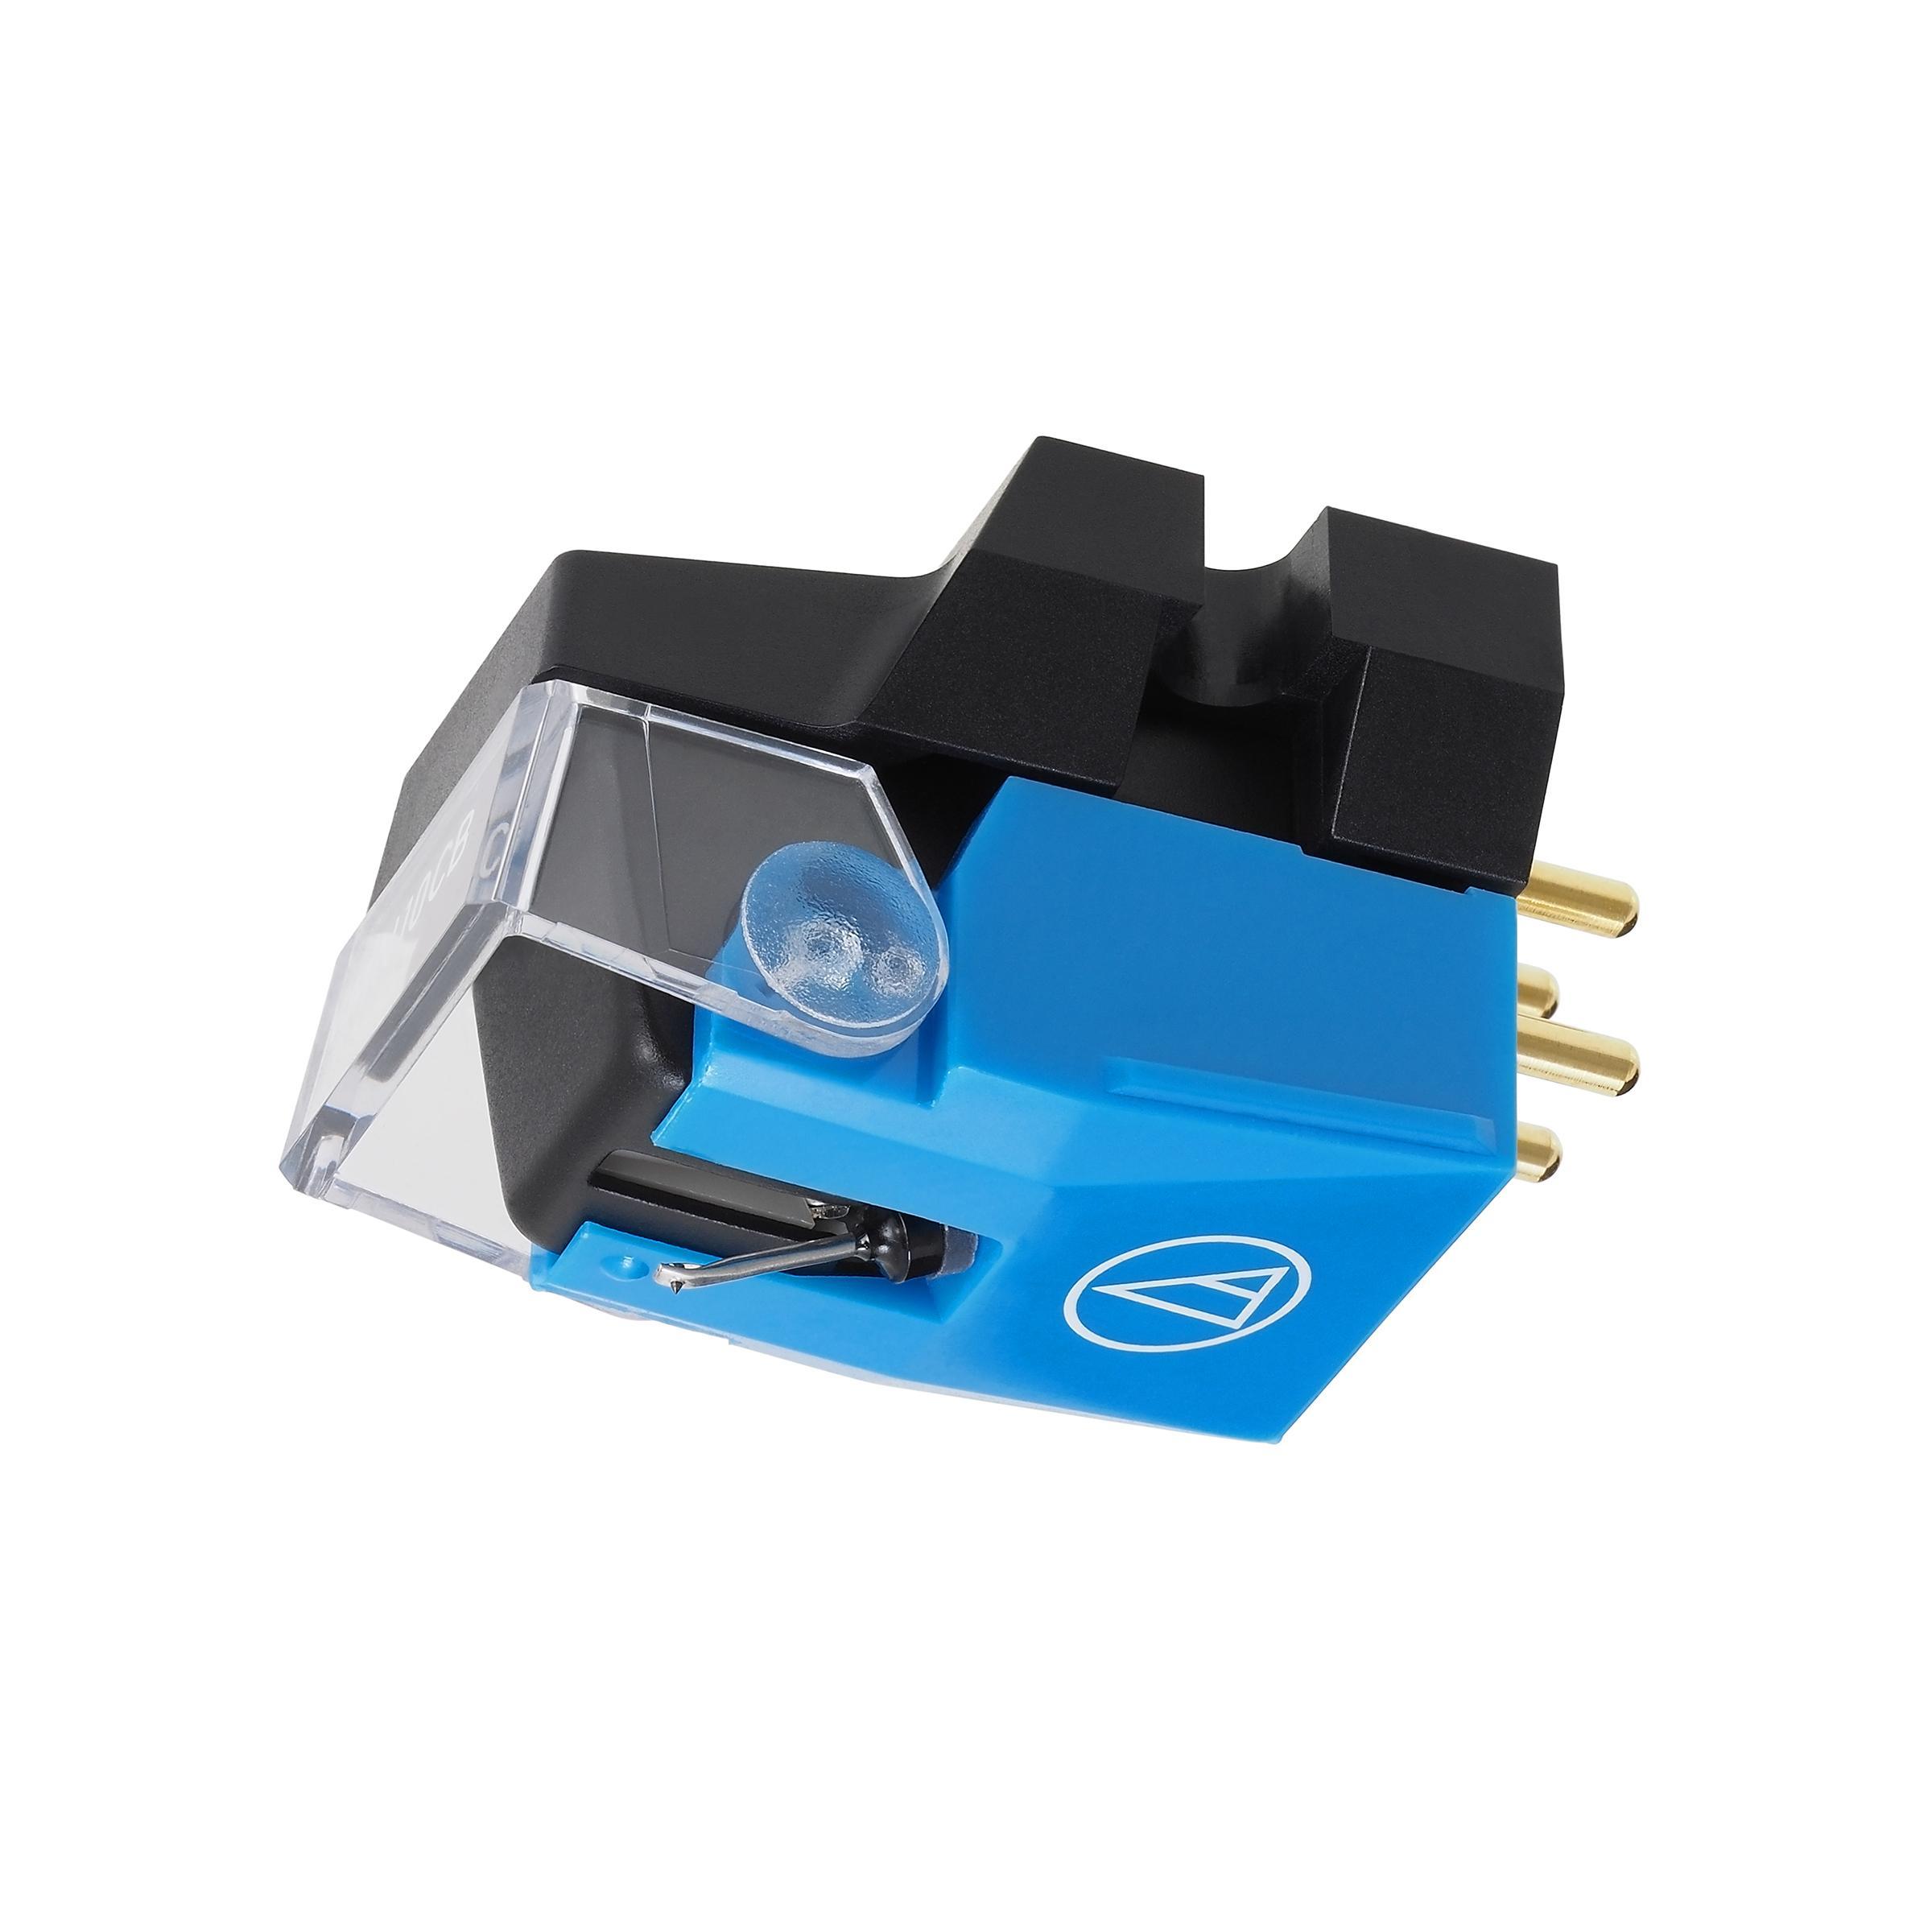 Amazon.com: Audio-Technica VM610MONO Dual Moving Magnet Stereo ... on